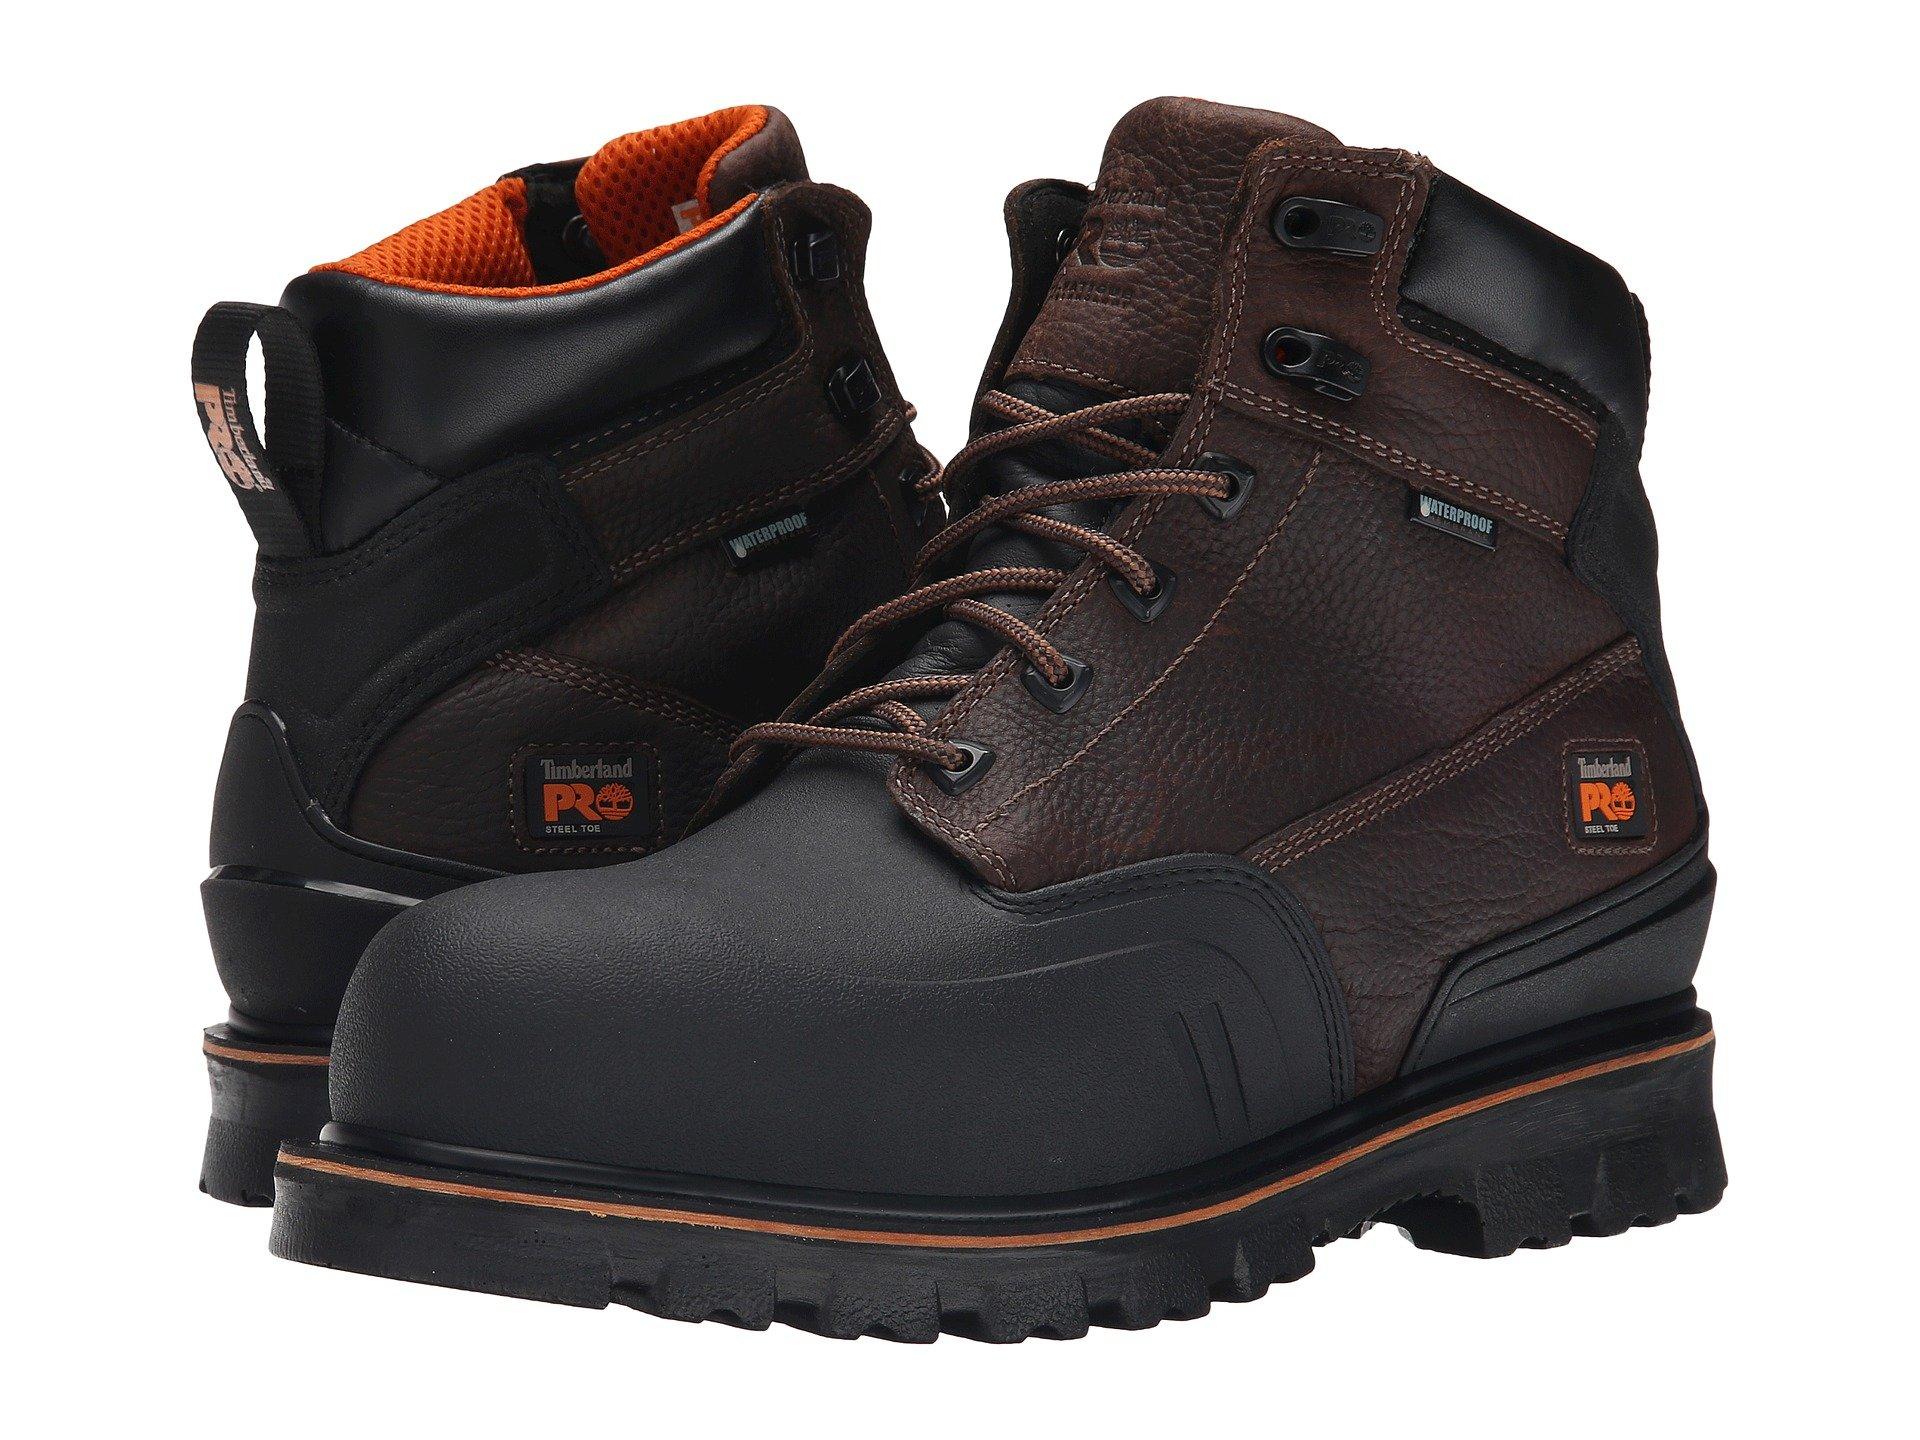 9e4b4c334748 Men s Timberland PRO Boots + FREE SHIPPING